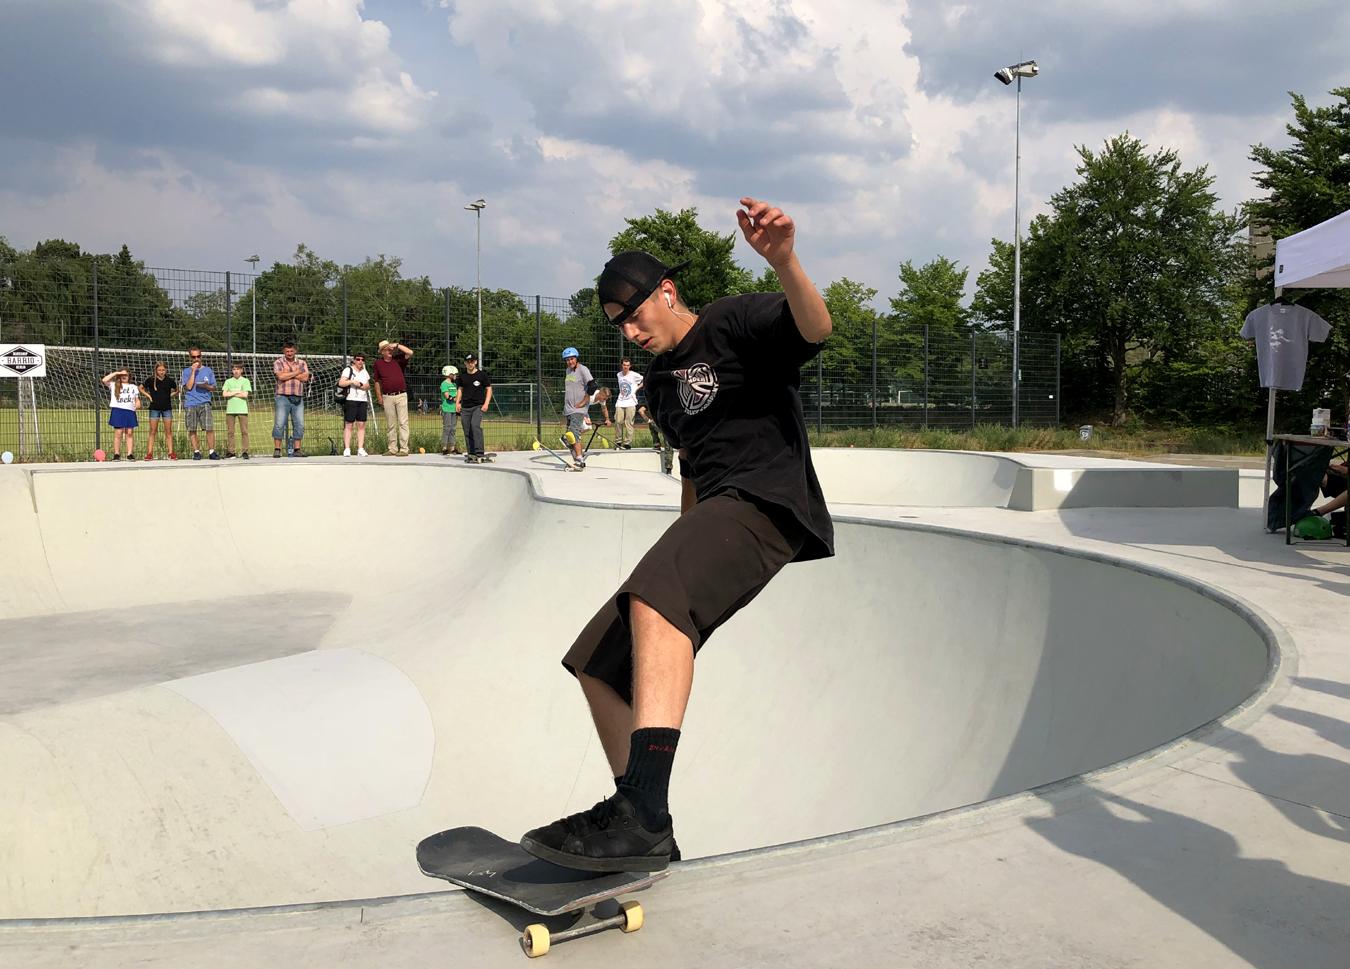 Skate Lippstaedter 3 a8